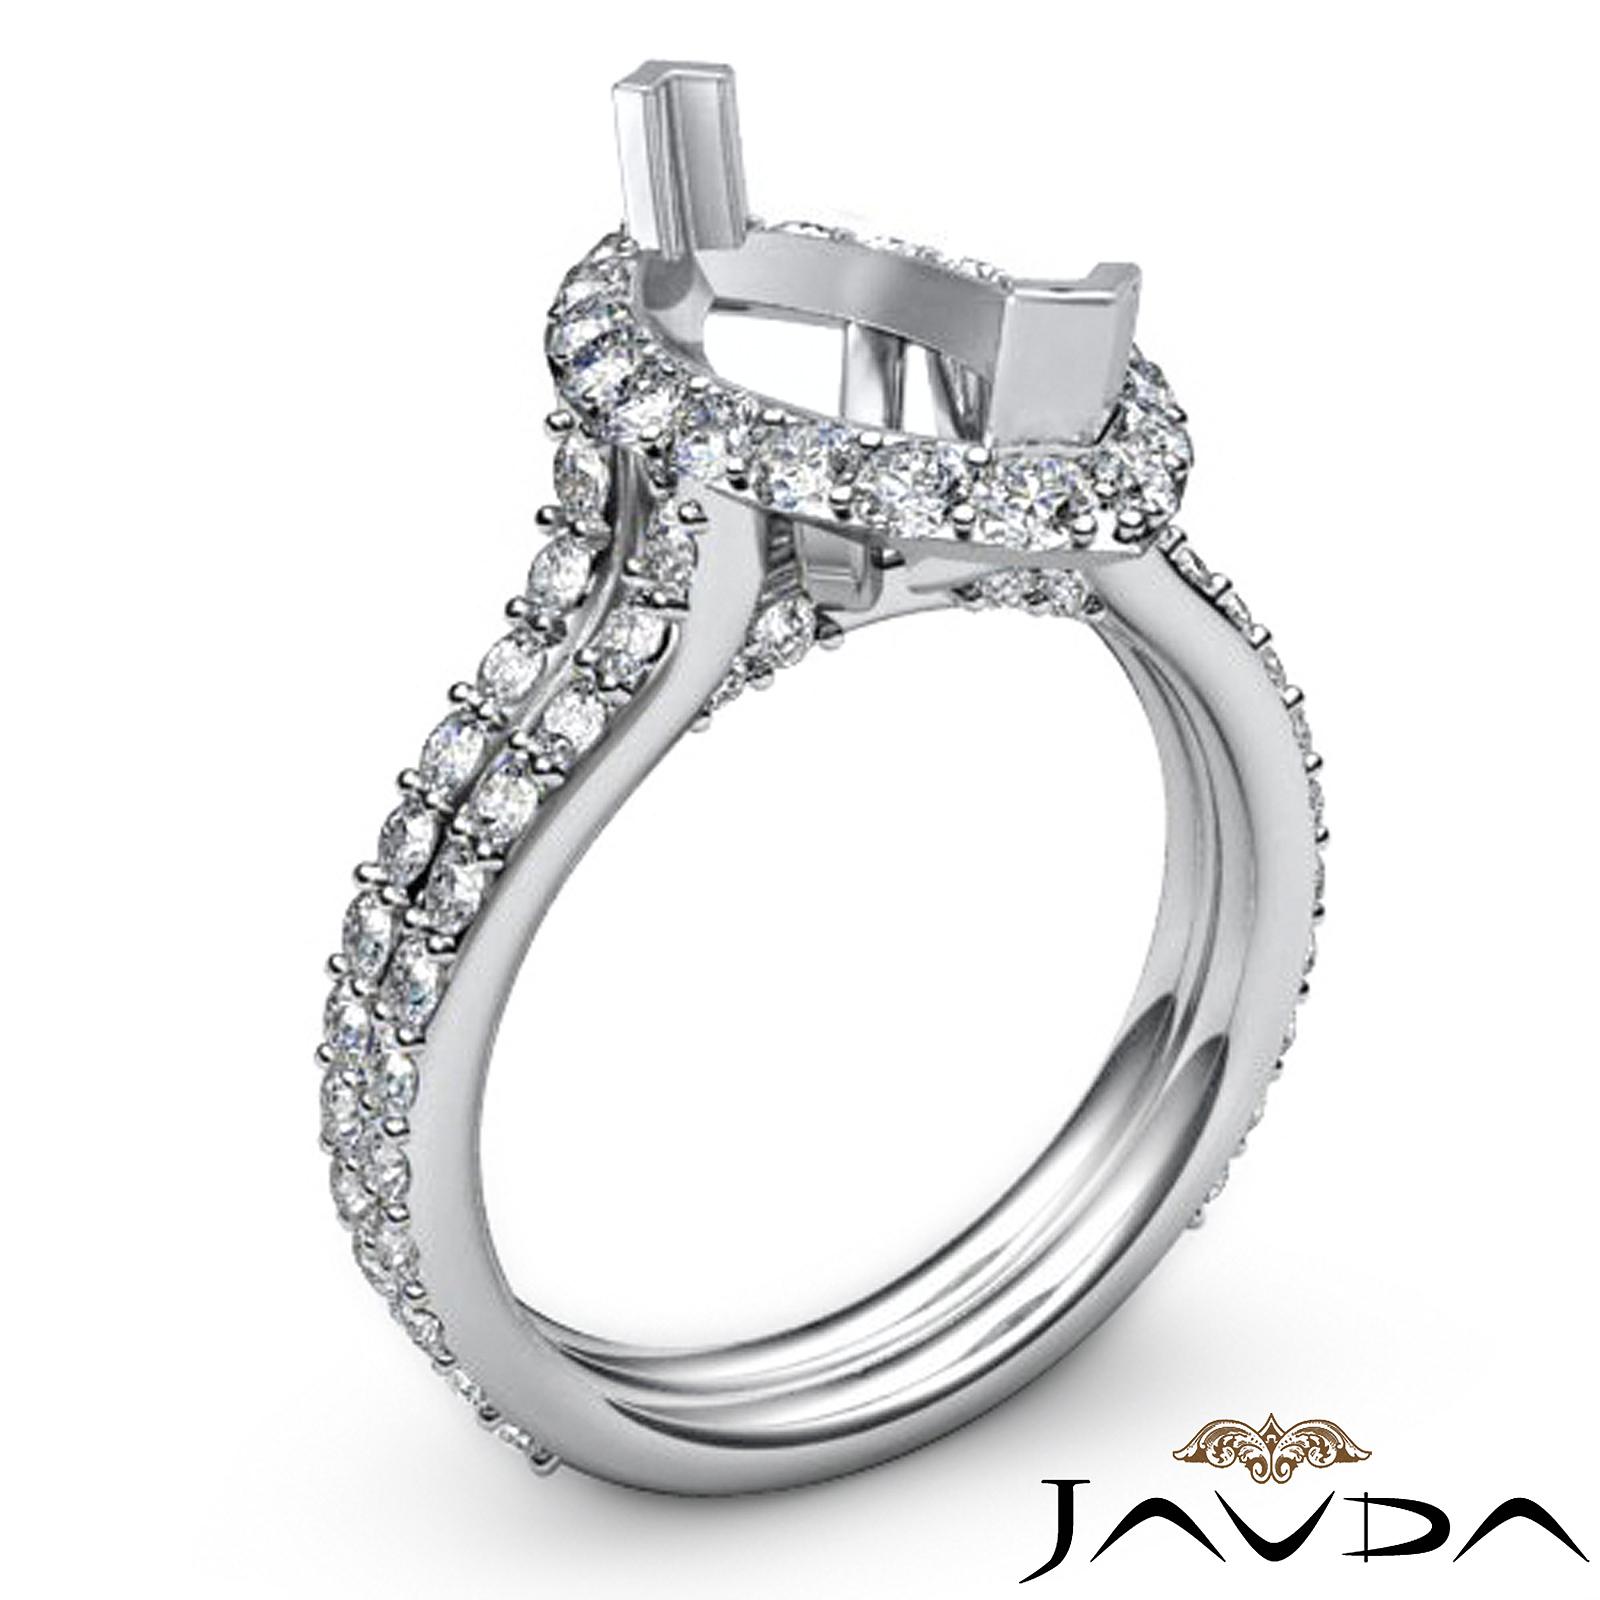 Halo Setting Diamond Engagement Ring Marquise Semi Mount 18k White Gold 1 36Ct